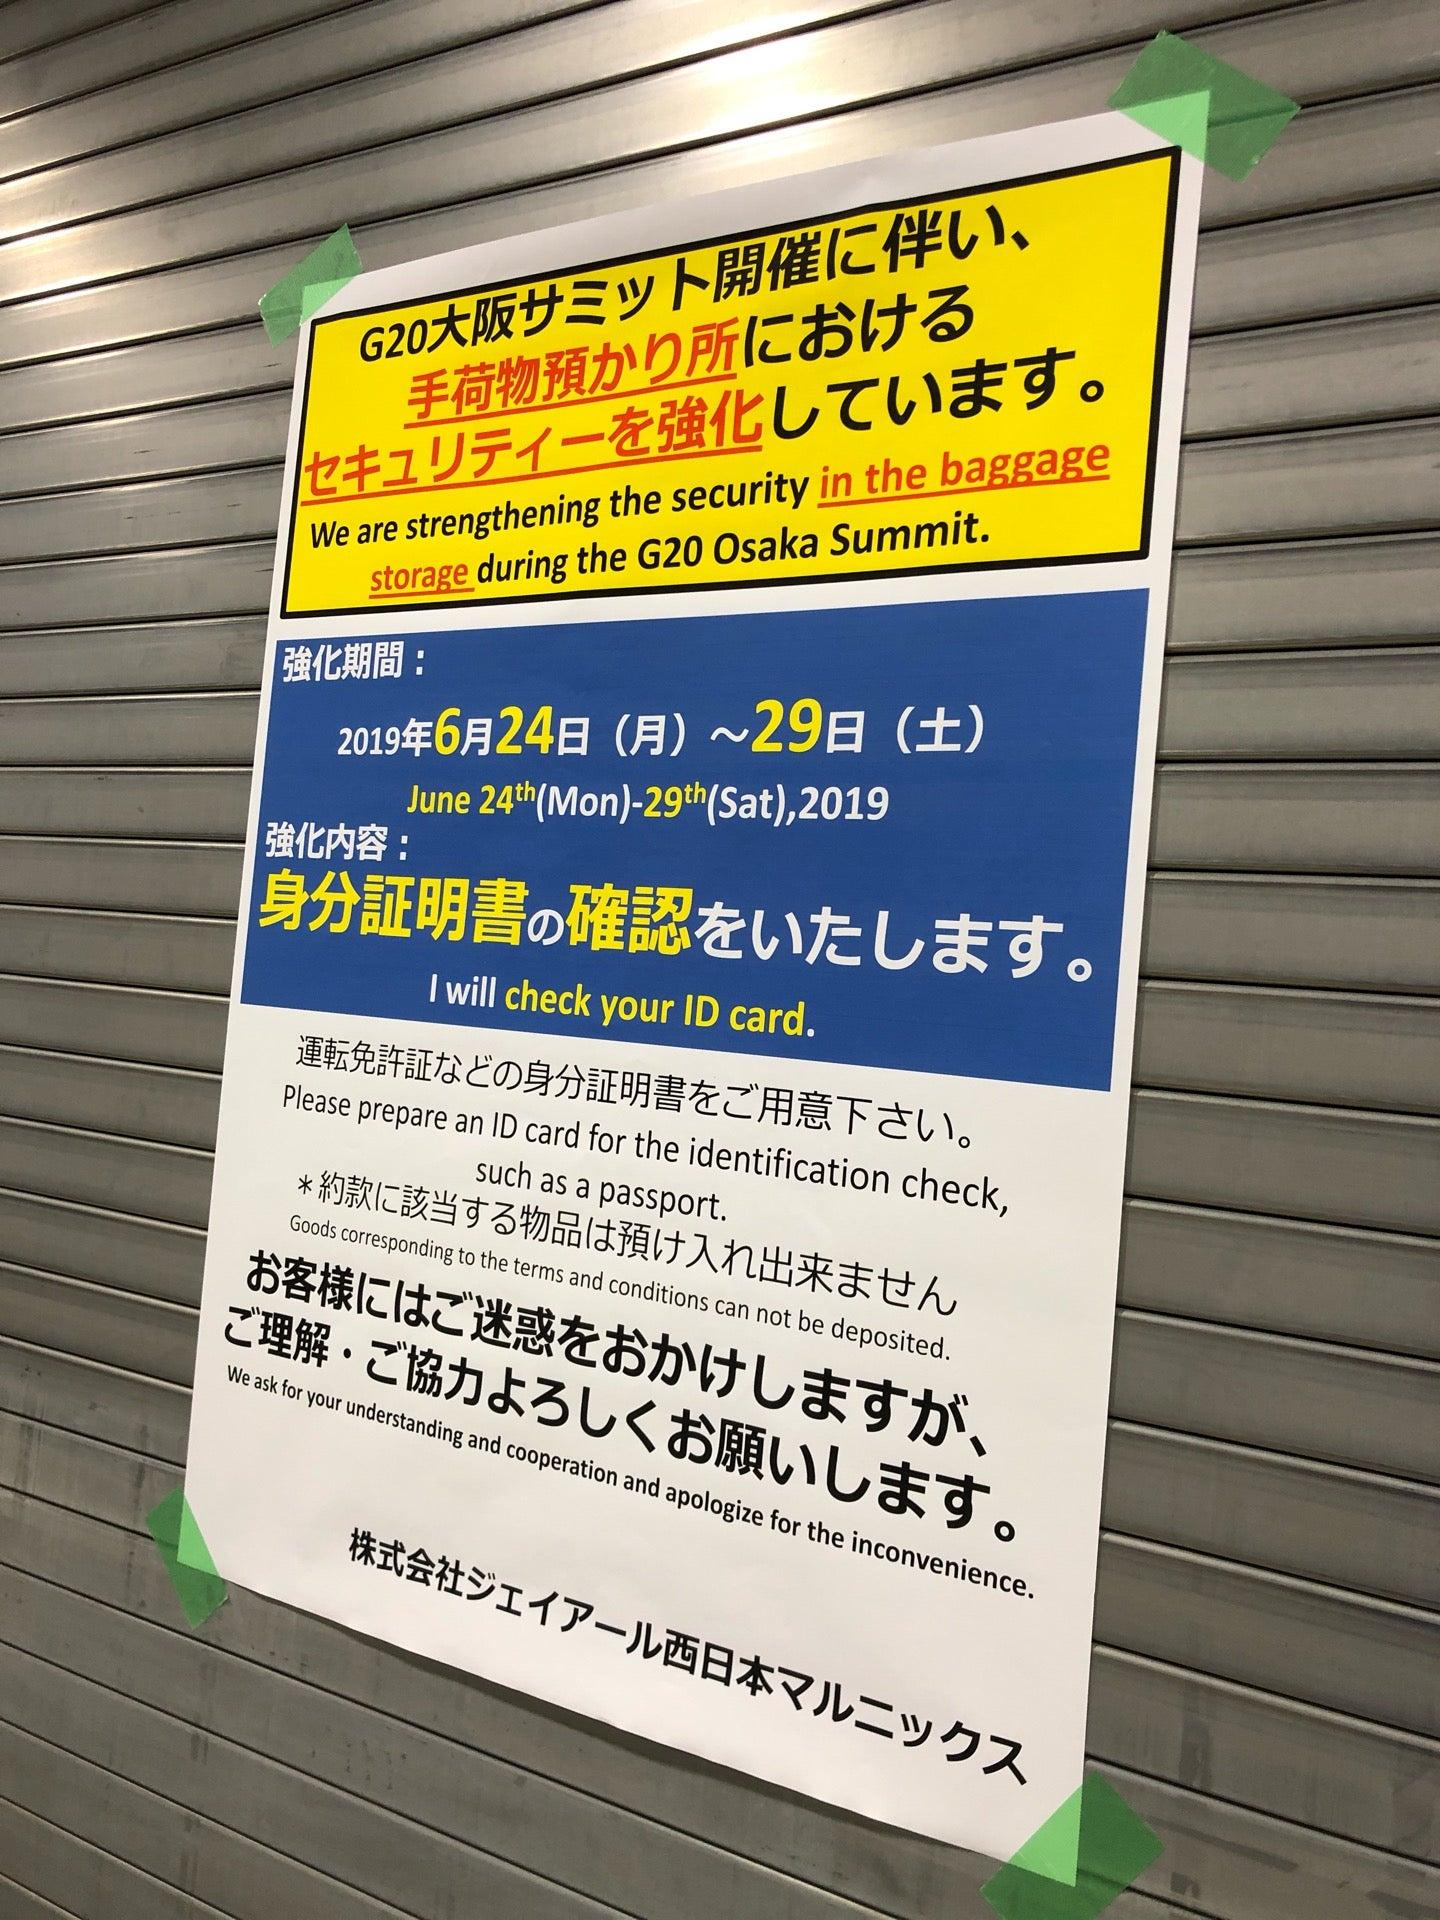 G20大阪サミットでコインロッカーは使えない。 (@ 大阪駅 in 大阪市, 大阪府) https://t.co/6AJNoUSHzA https://t.co/ZMNeZ4Esiq